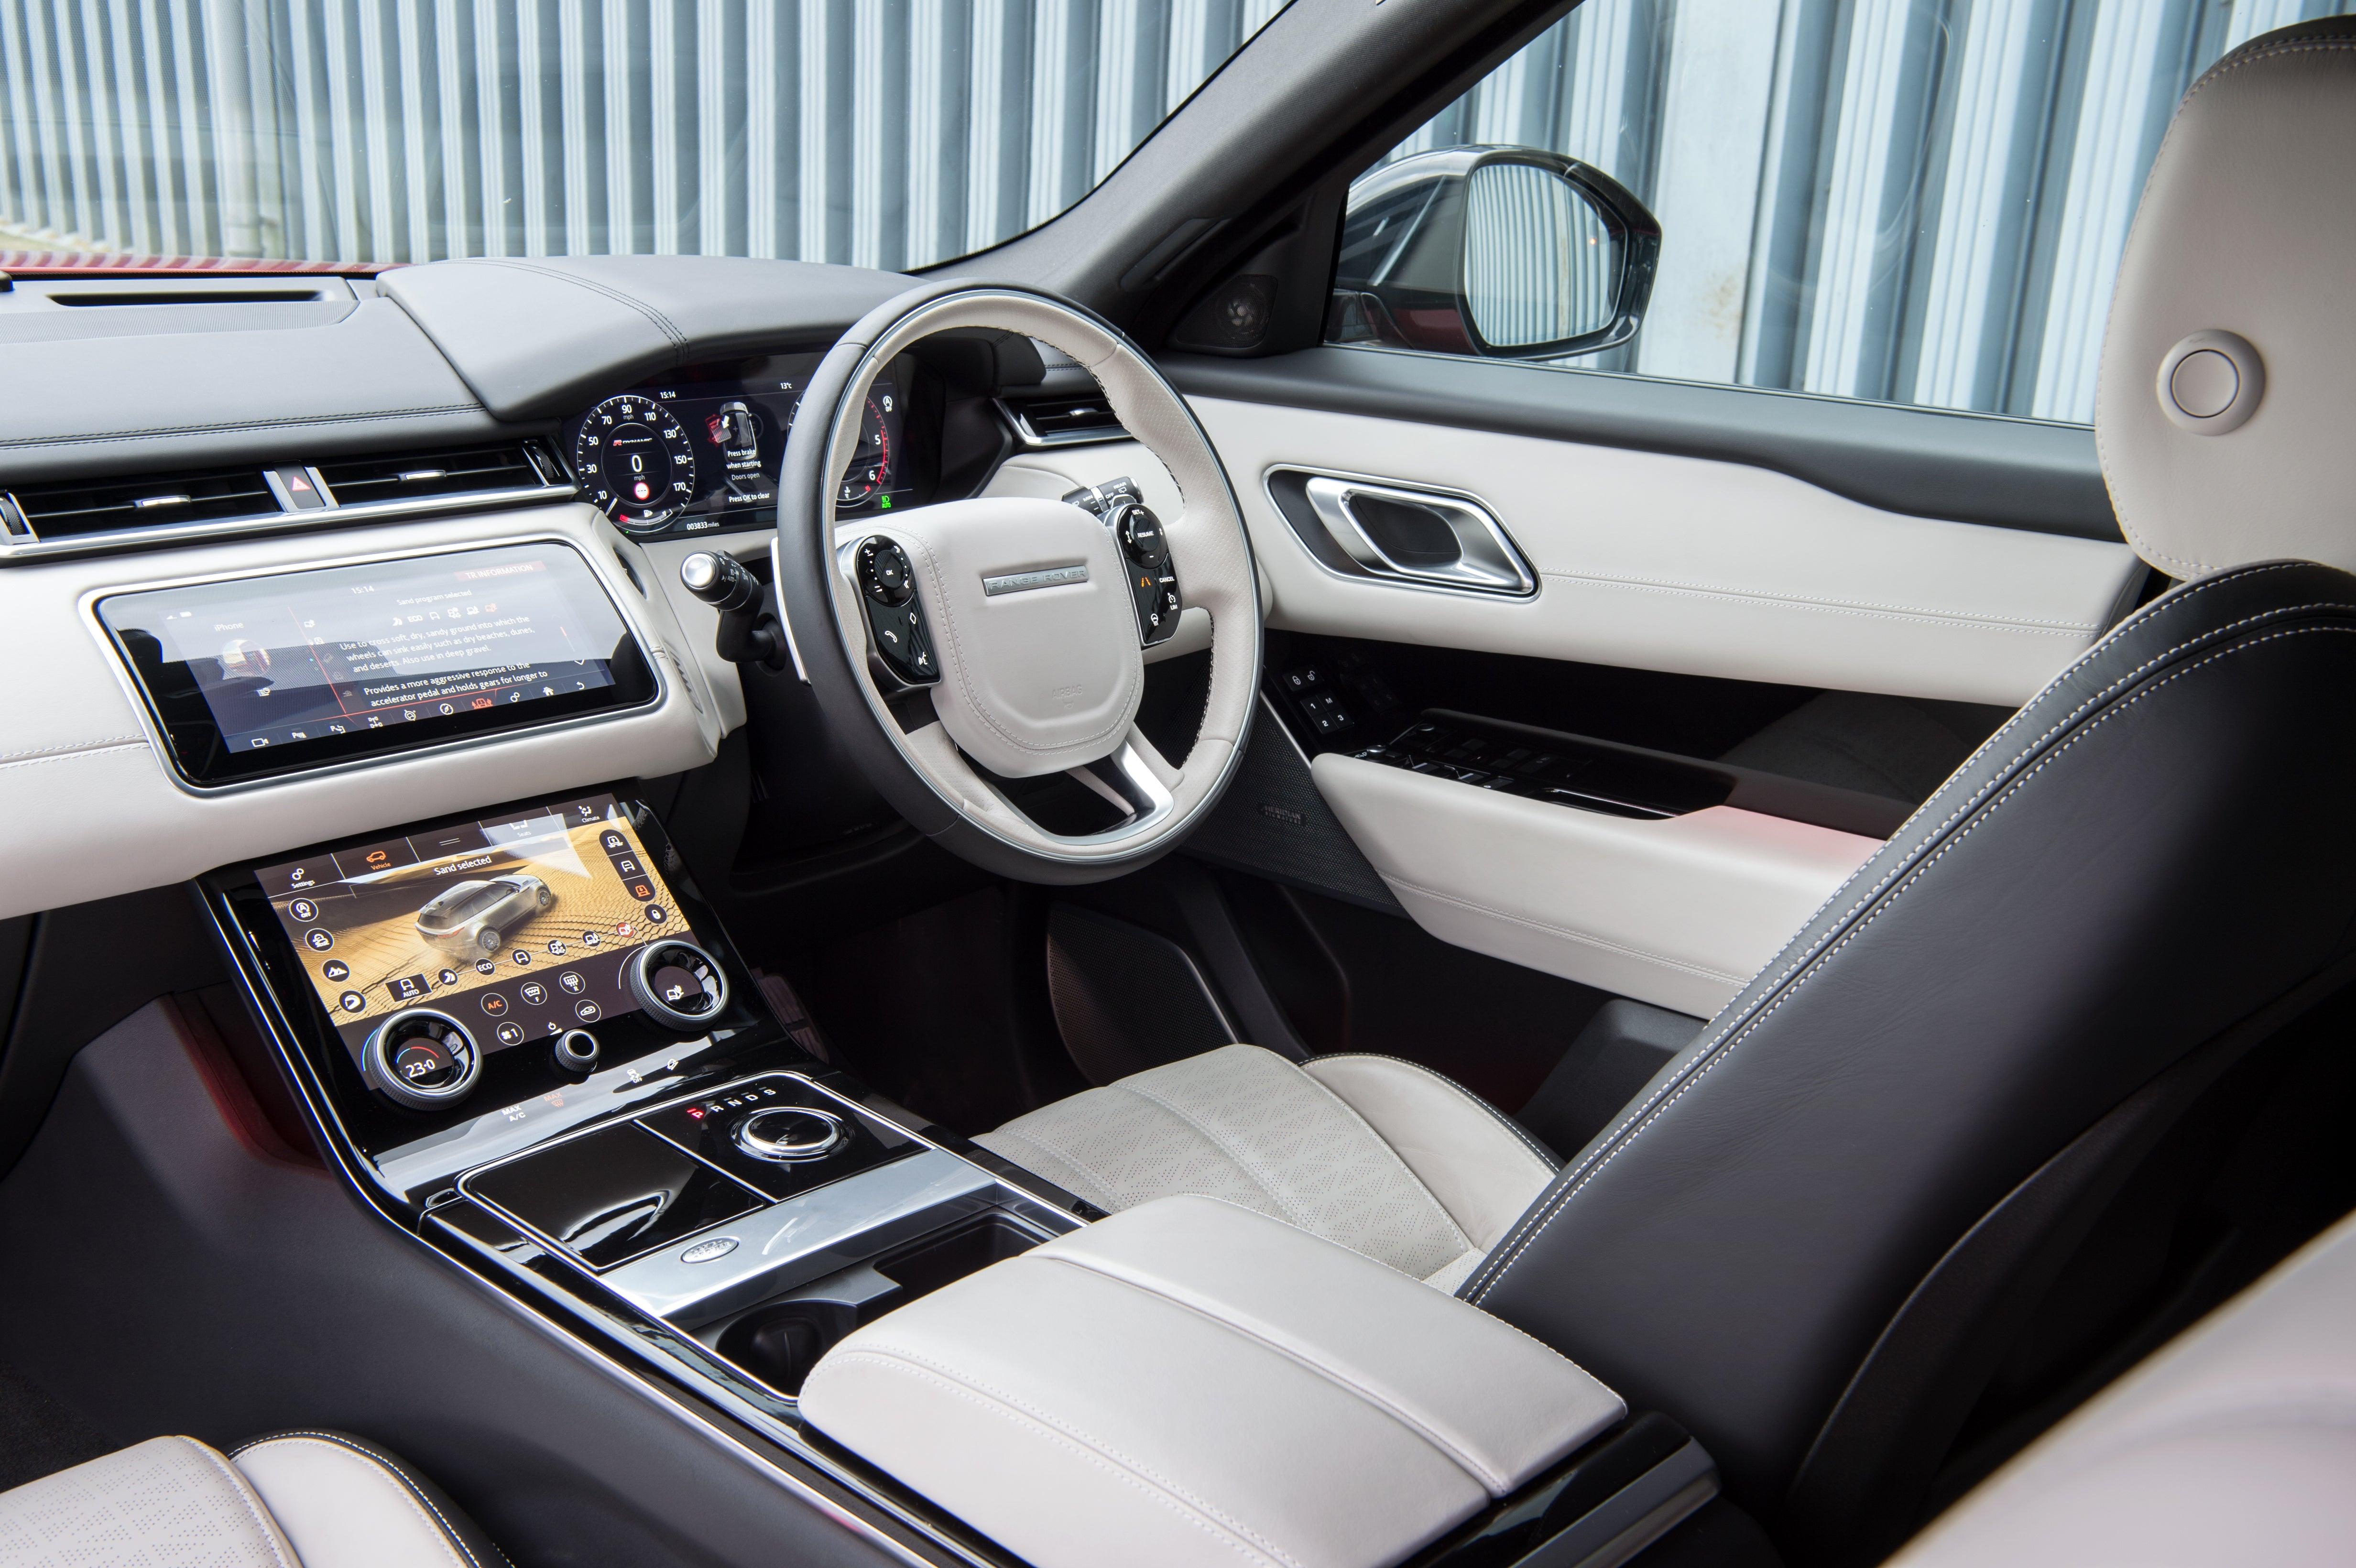 Range Rover Velar front interior